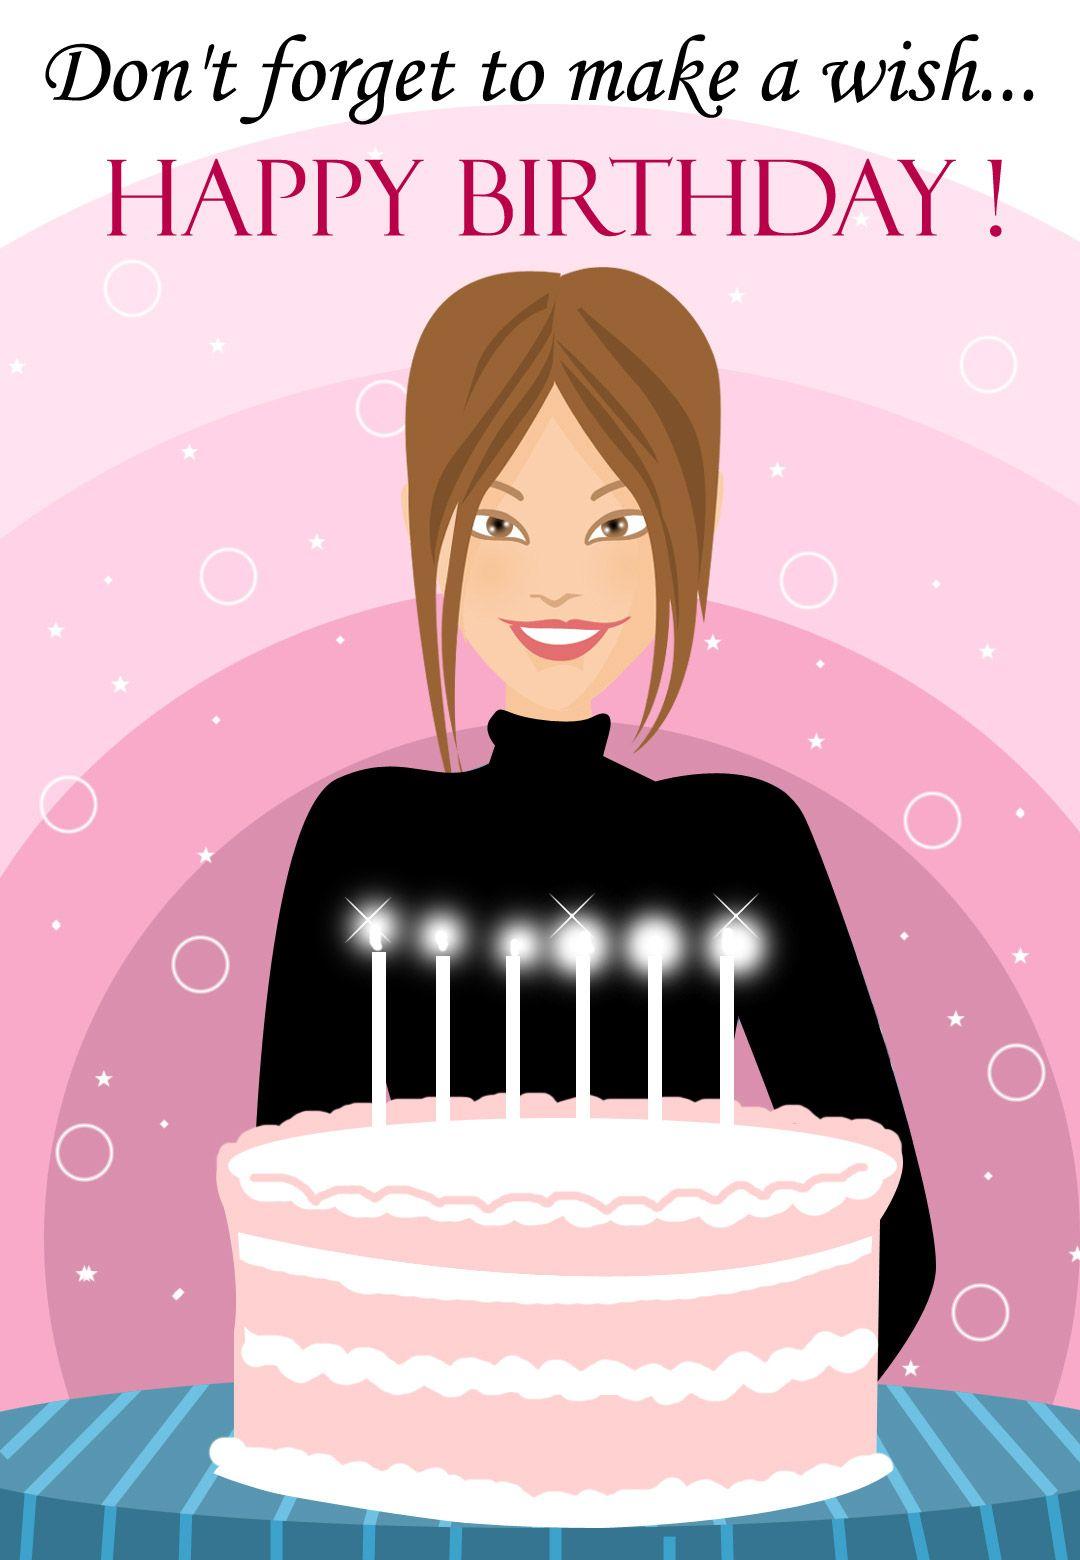 Make A Wish Free Printable Birthday Card Greetings Island Free Printable Birthday Cards Birthday Card Printable Happy Birthday Me